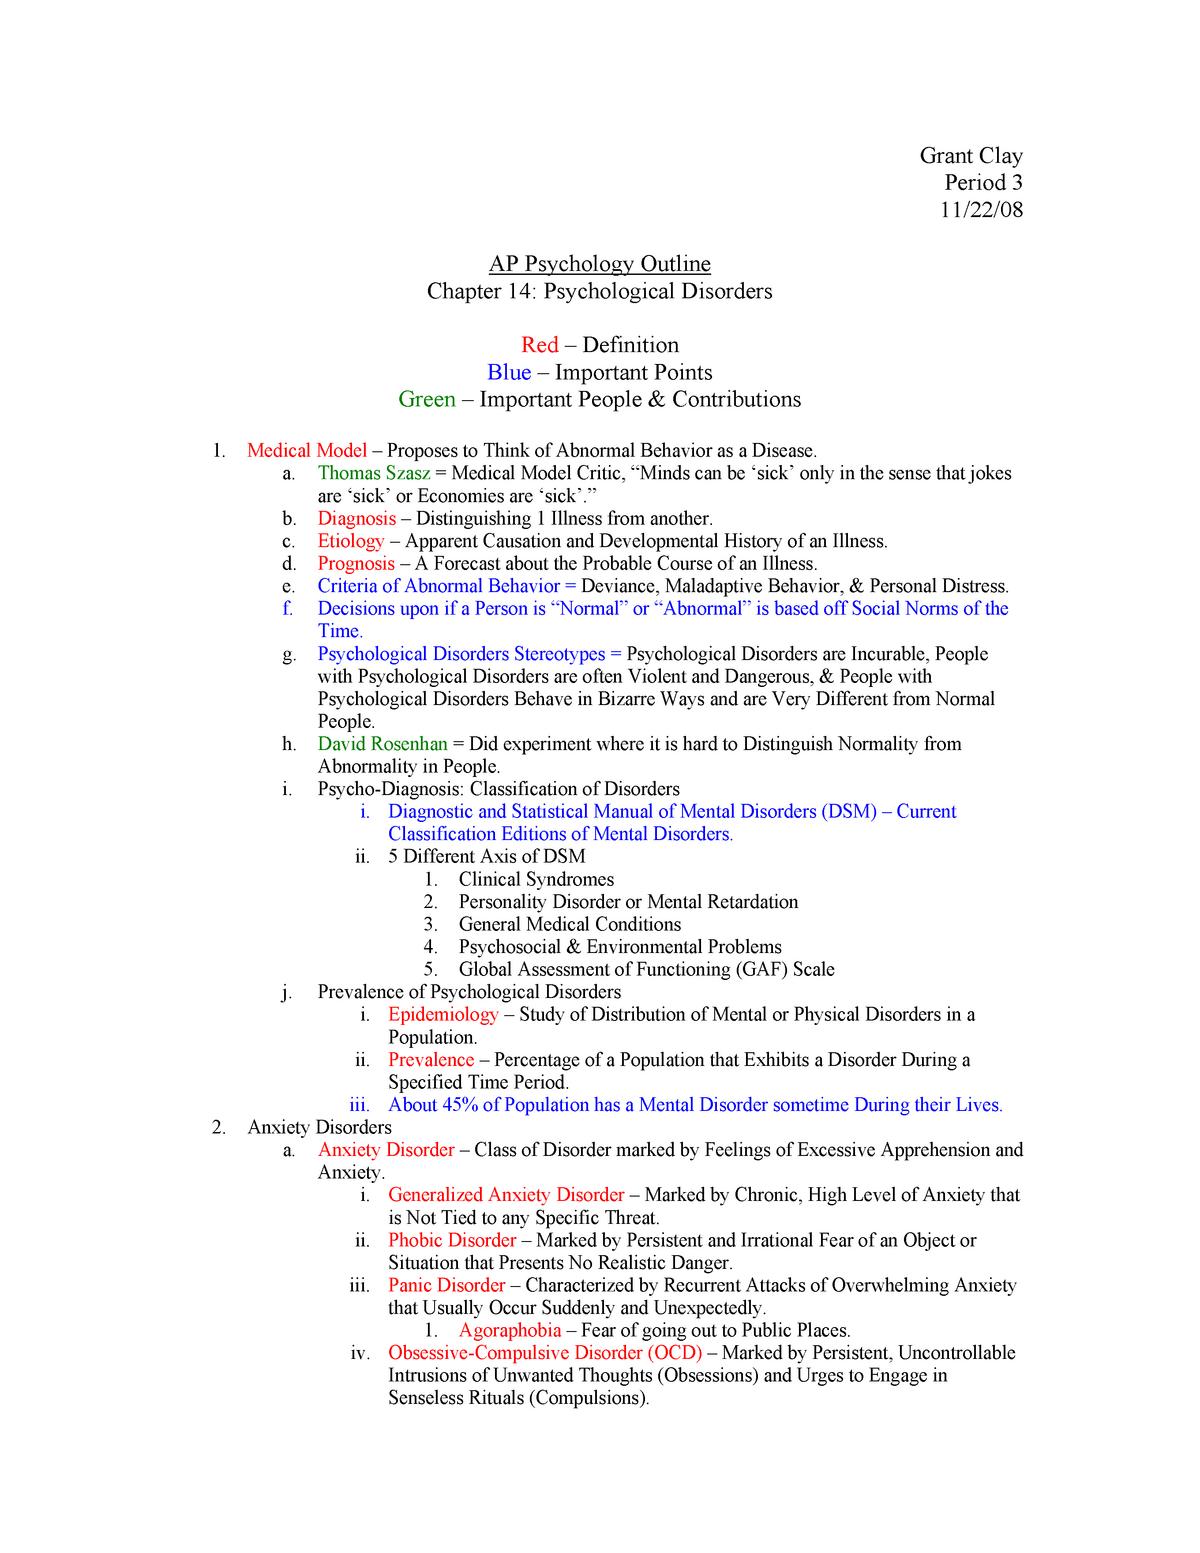 APP Ch 14 Outline Psychological Disorders - PSCH 350 - StuDocu